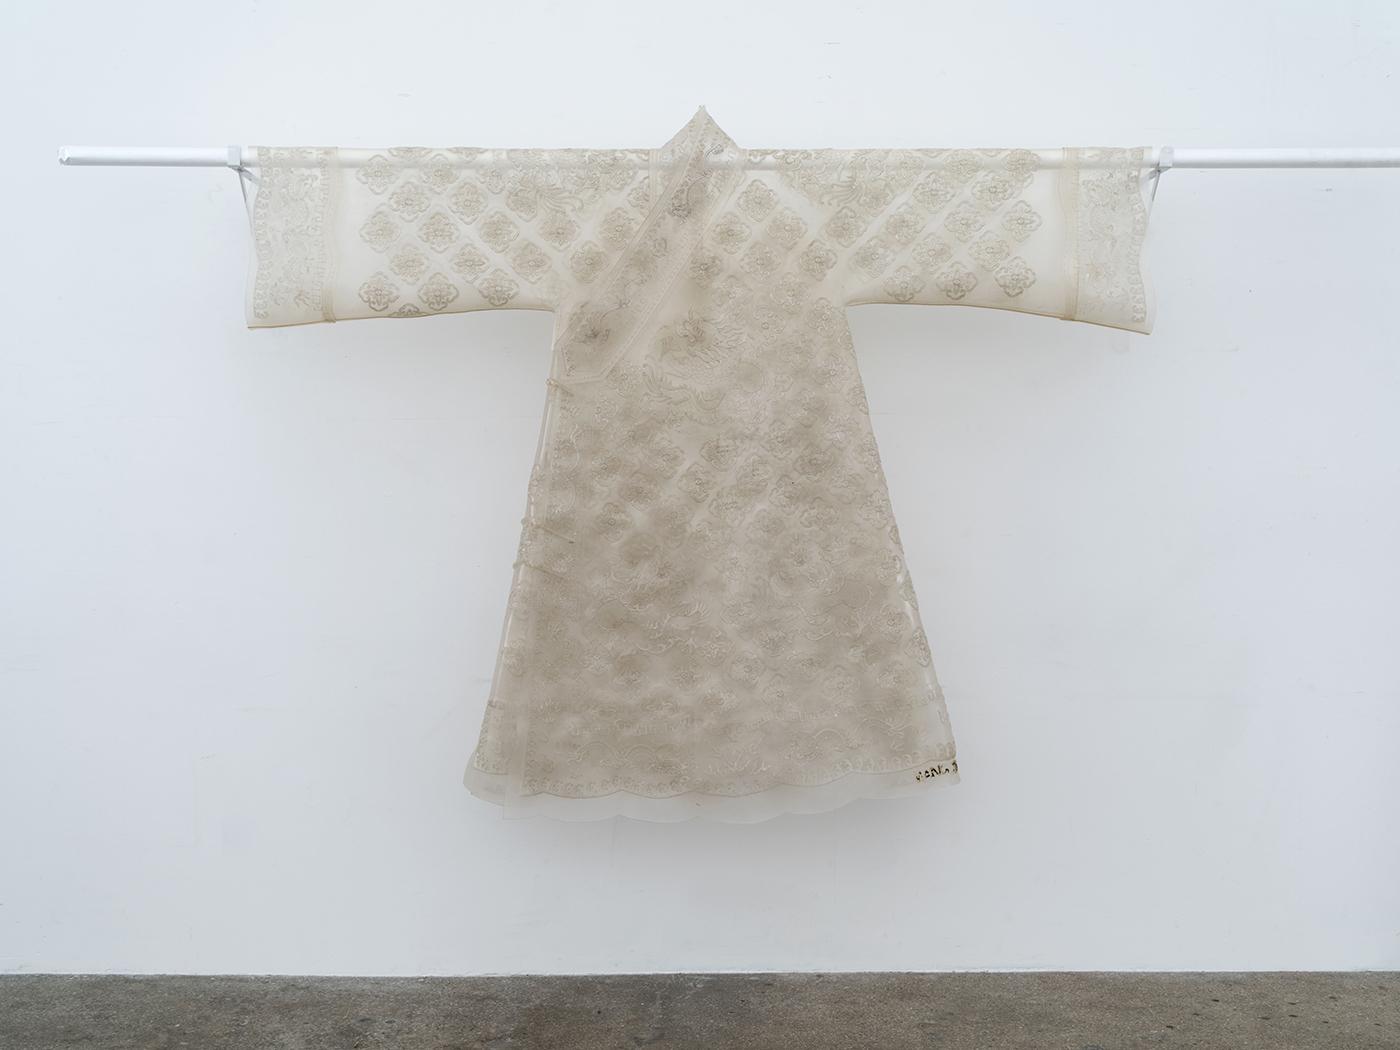 Wang Jin, A Chinese Dream, 2006. Photo by Catalina Ayubi Photography.